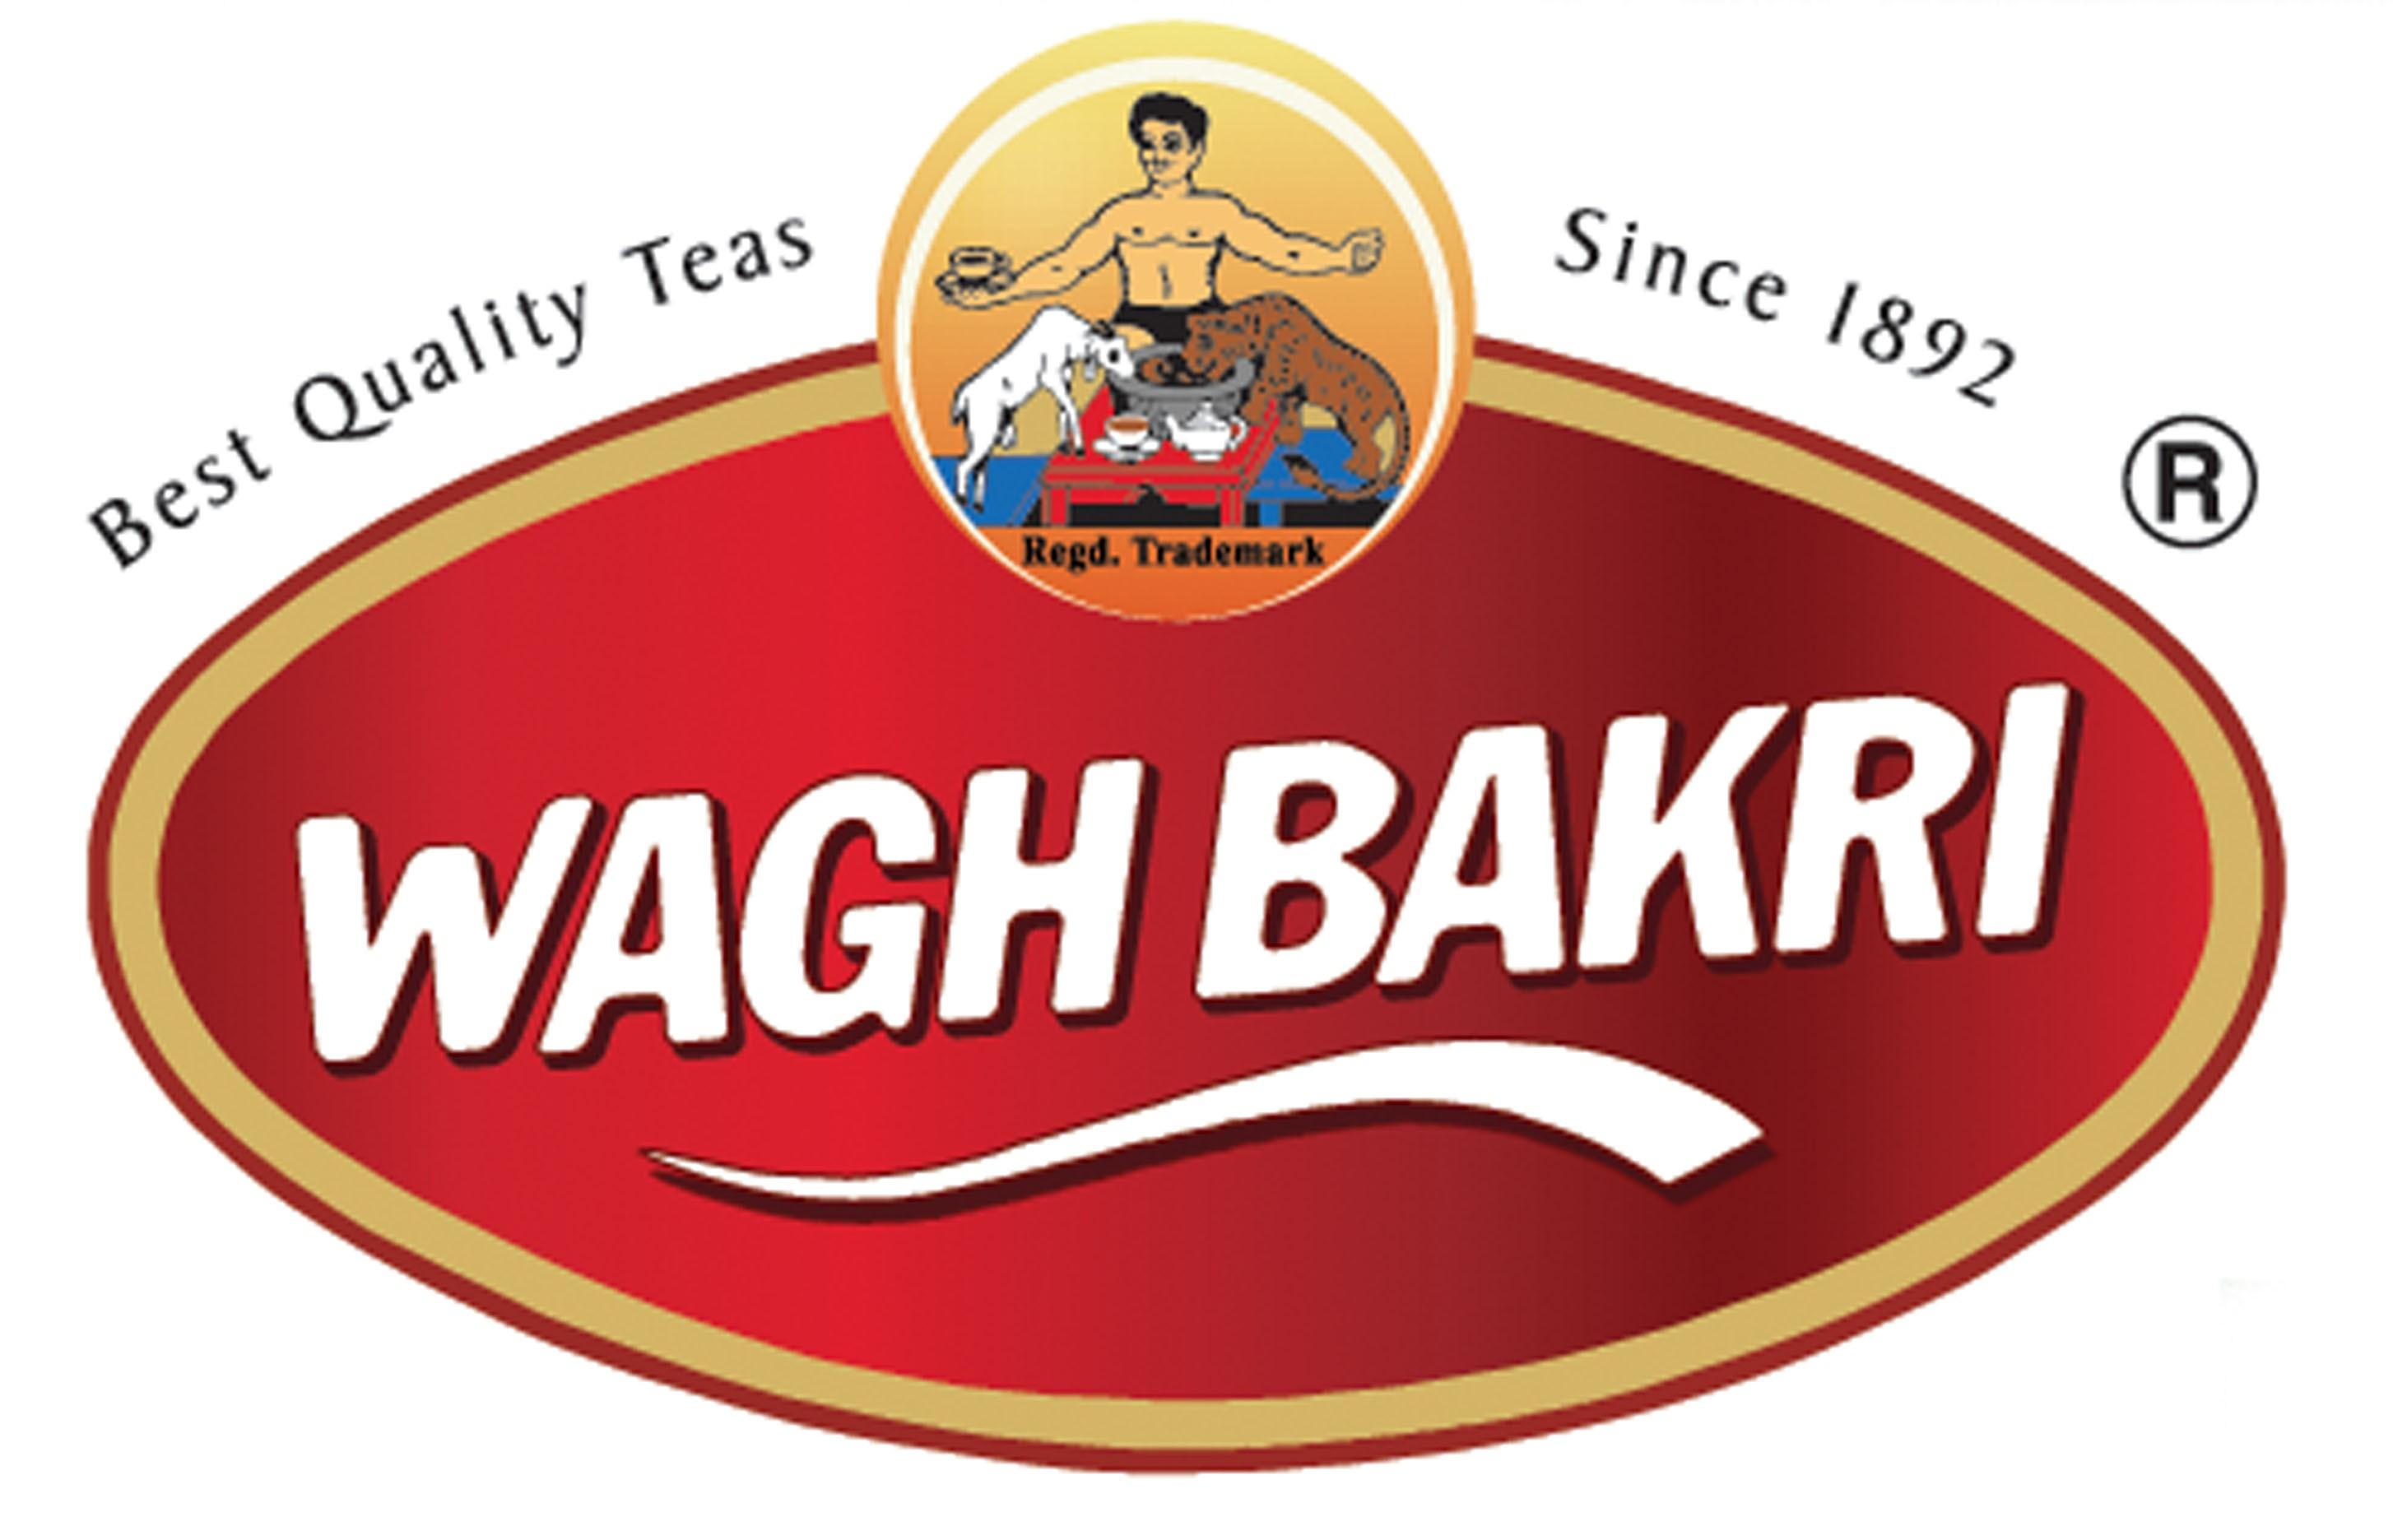 WaghBakri